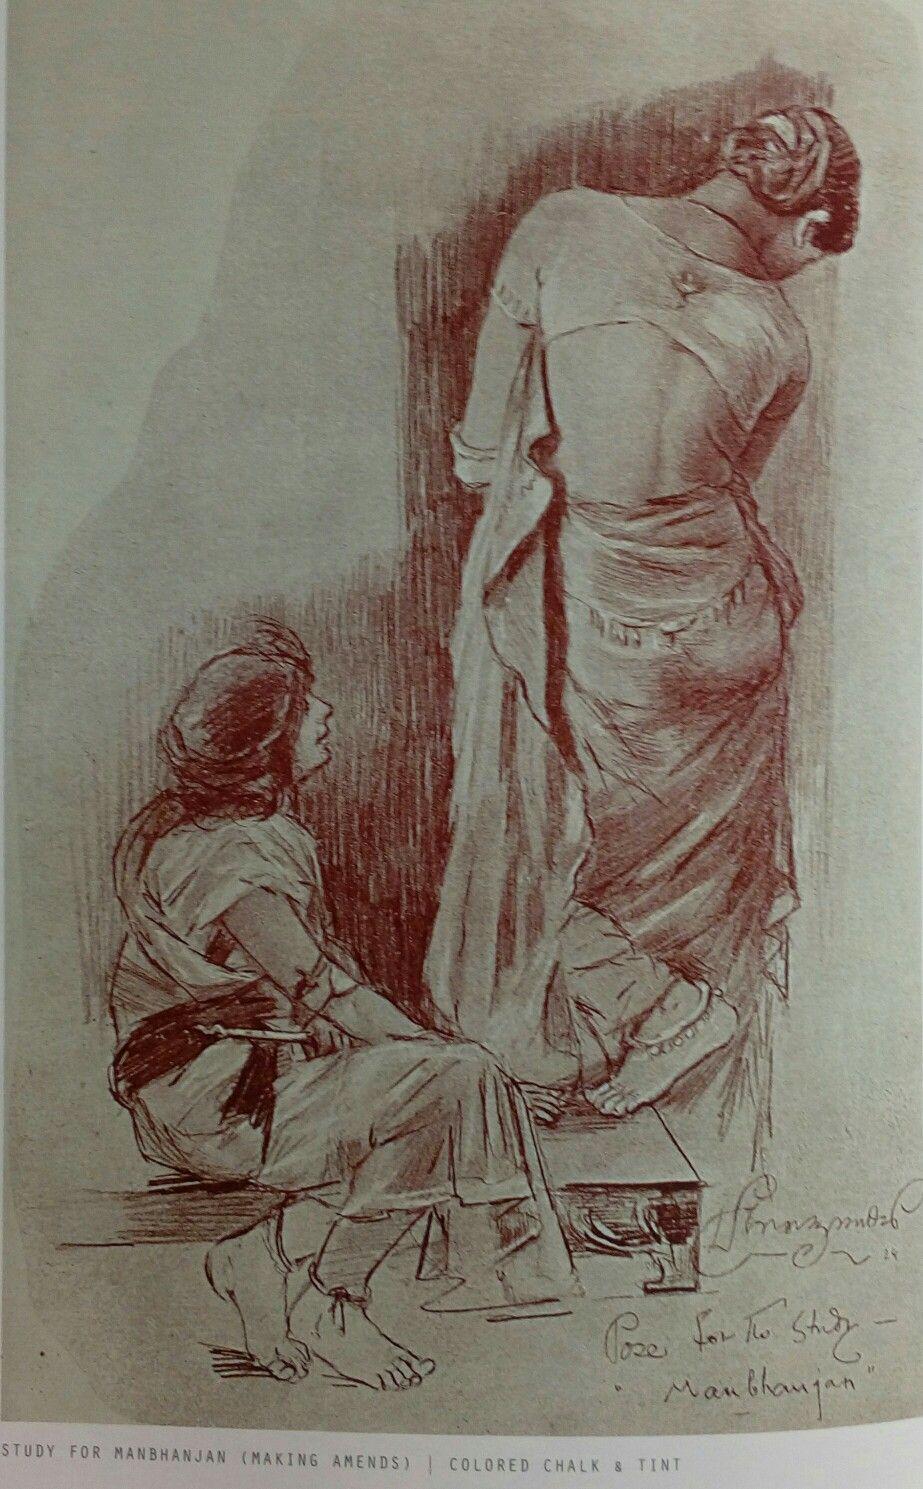 Study for manbhanjan making amend by hemen majumdar